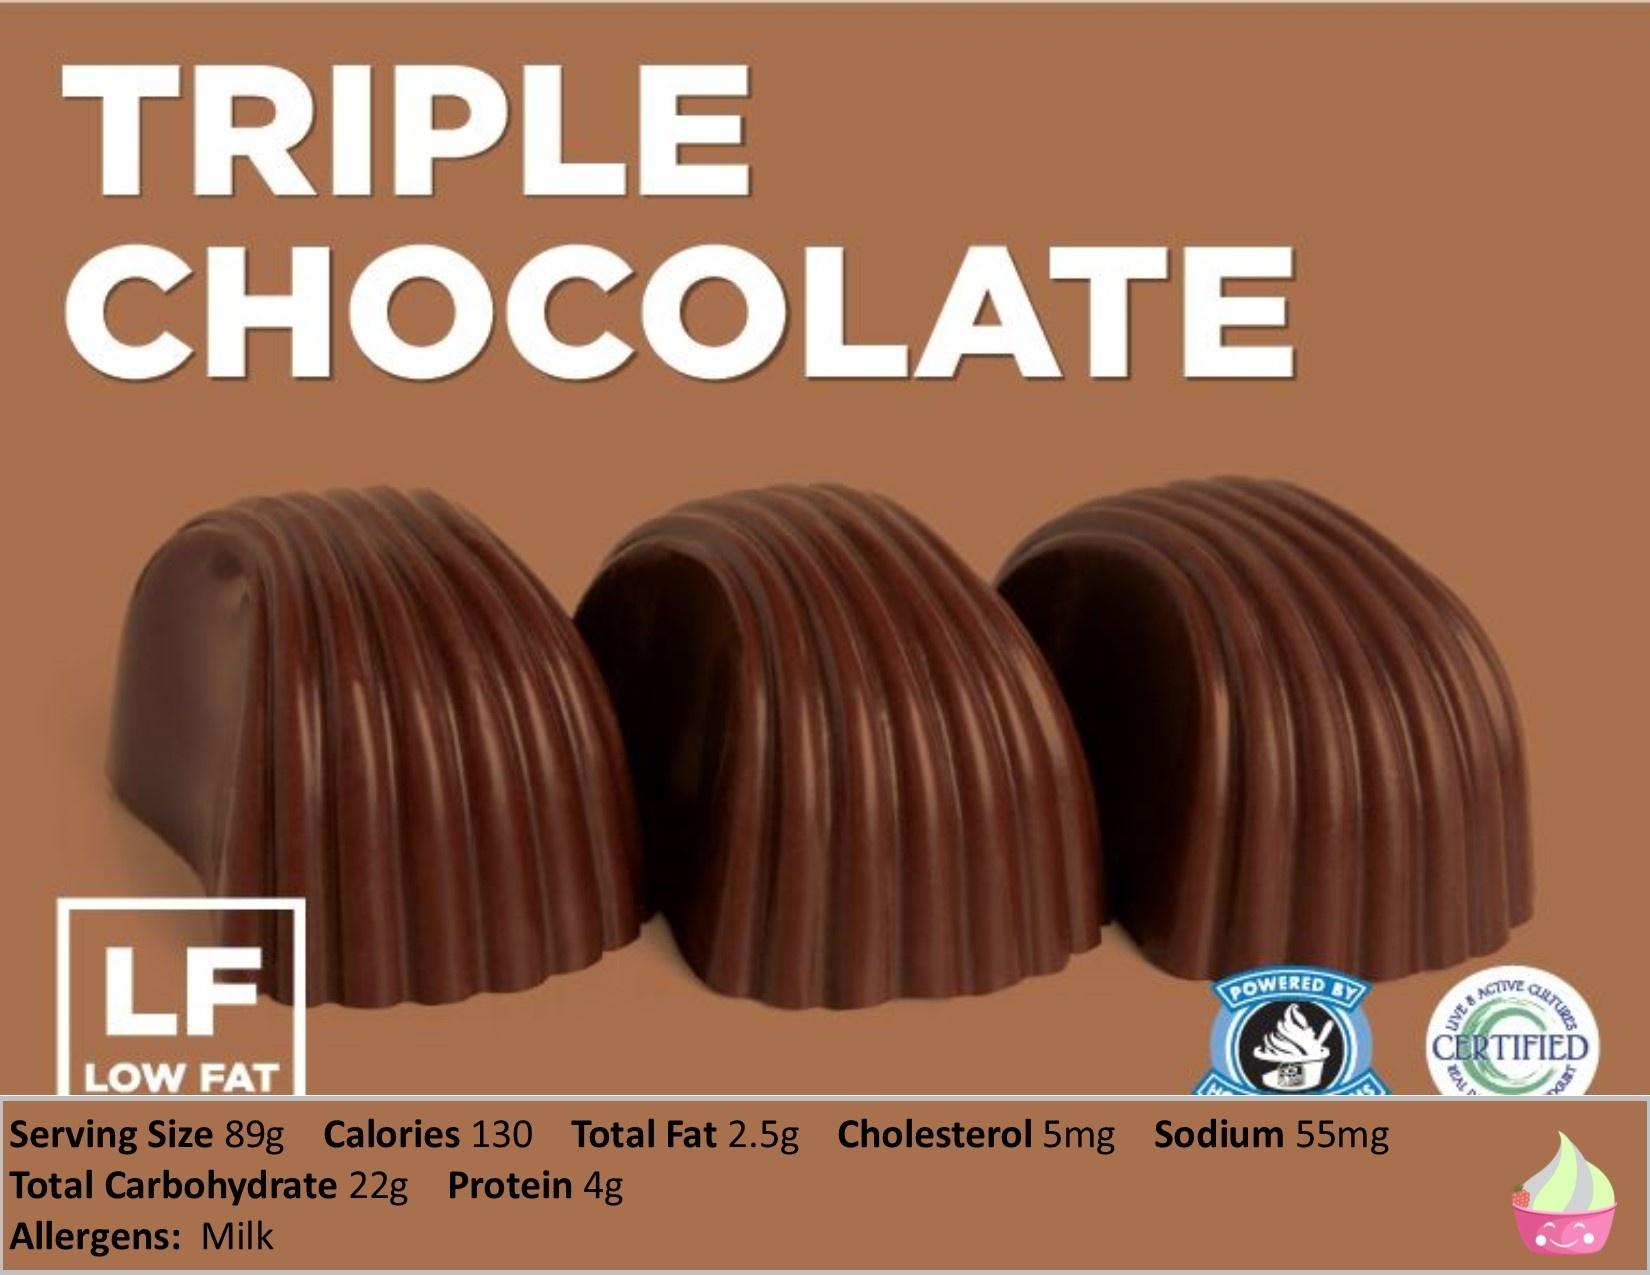 https://0201.nccdn.net/1_2/000/000/11d/7e8/Triple-Chocolate-LF-1650x1275-1650x1275.jpg